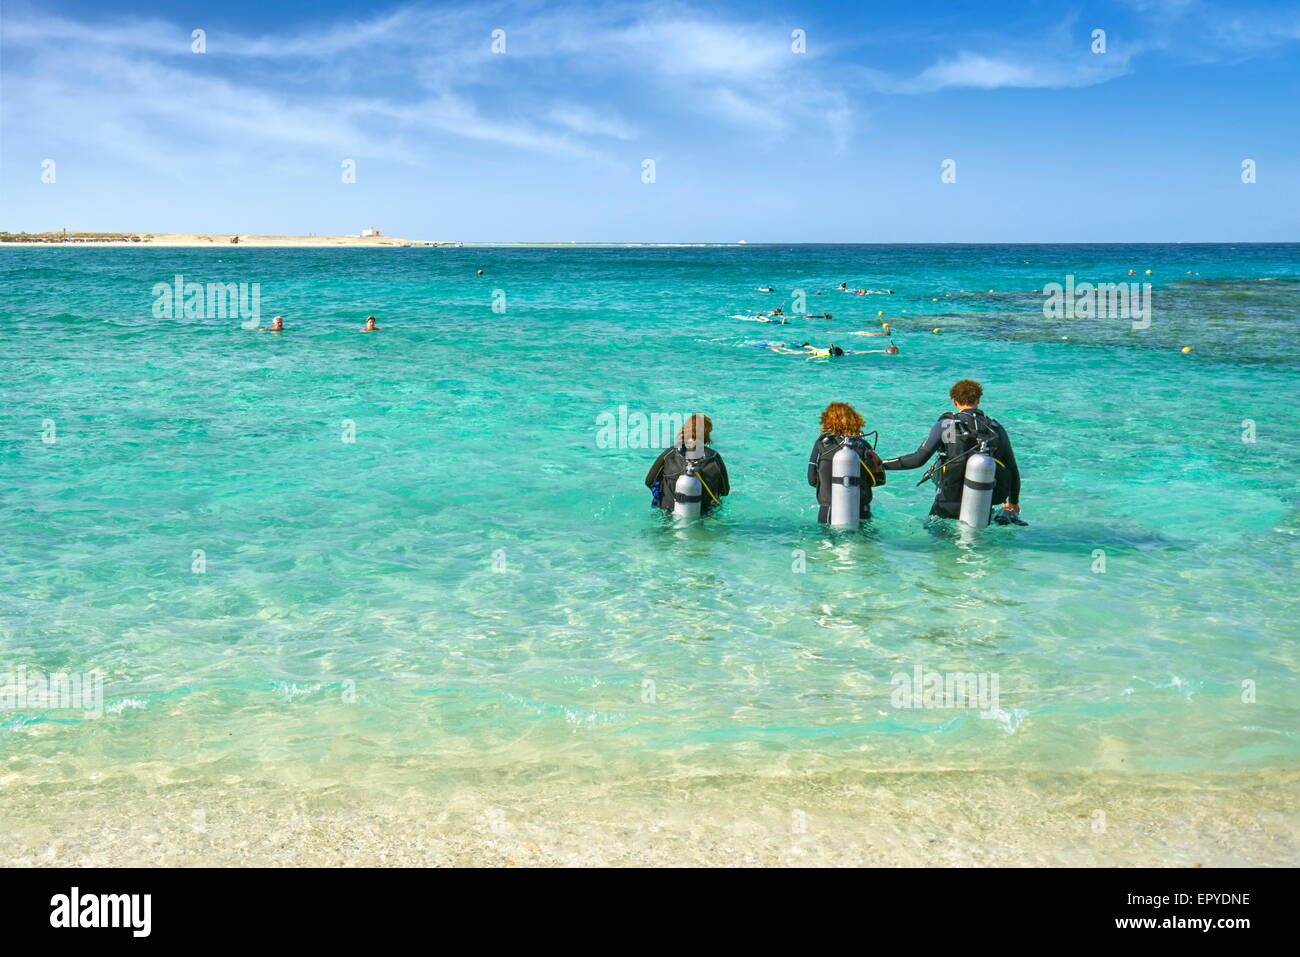 Marsa Alam, divers in Abu Dabbab Bay,  Red Sea, Egypt - Stock Image